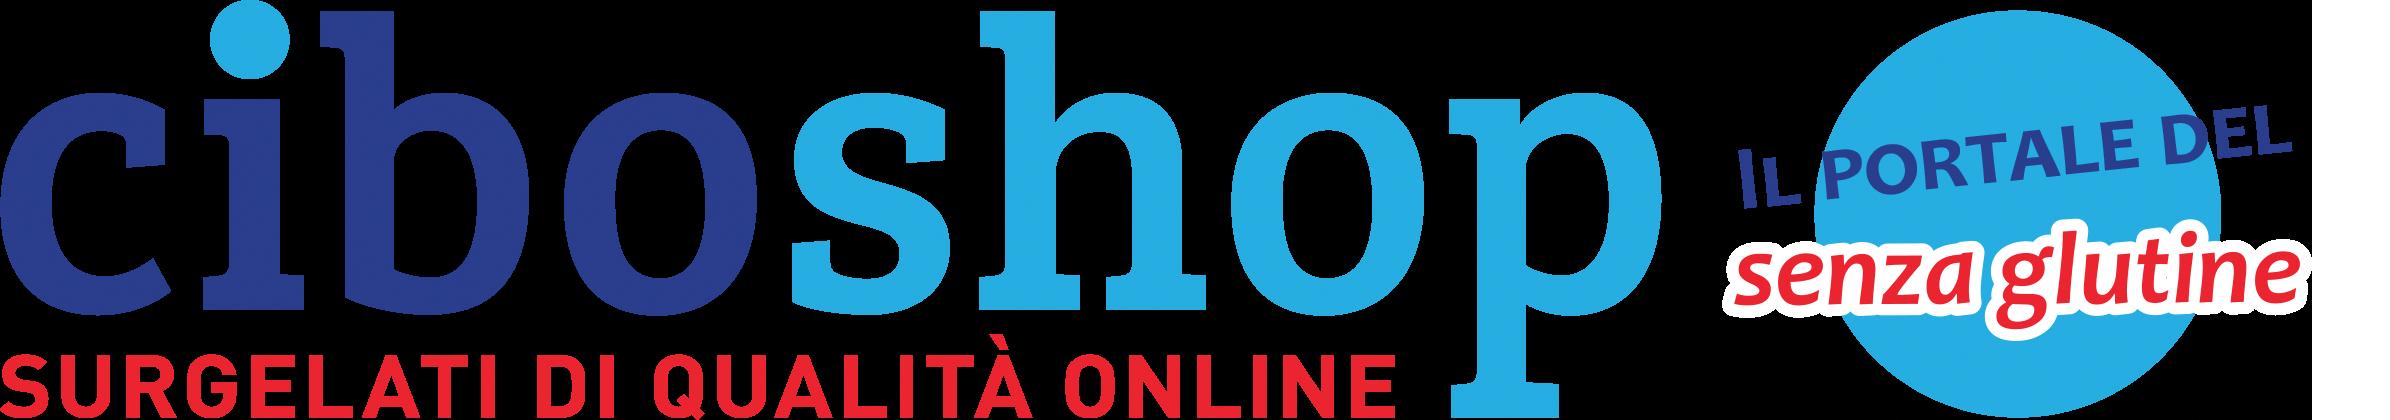 CiboShop